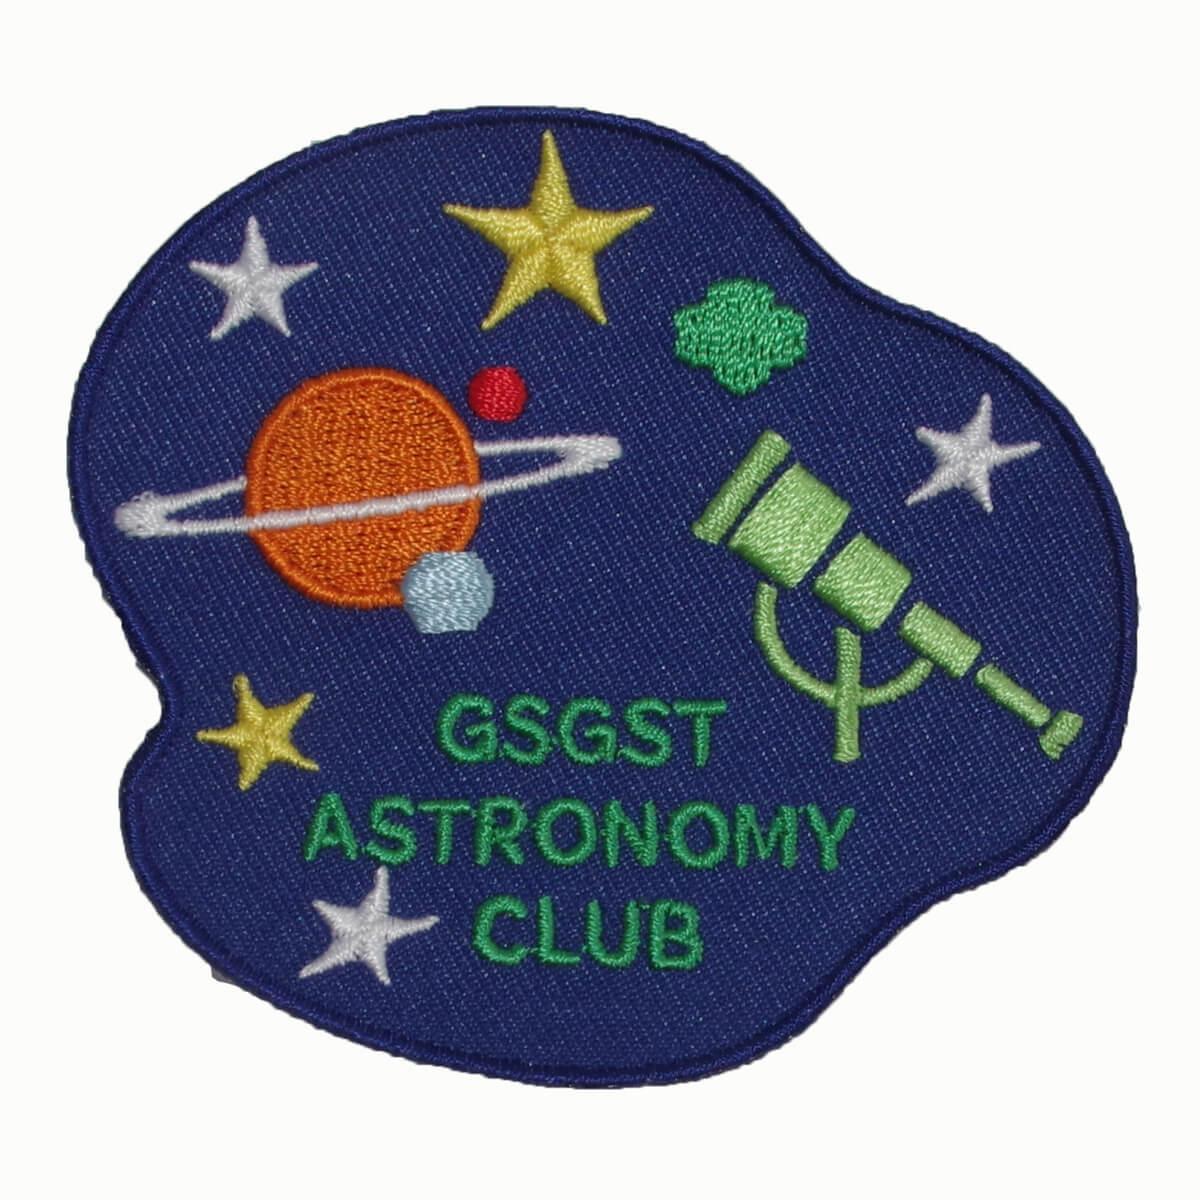 GSGST Astronomy Club Patch